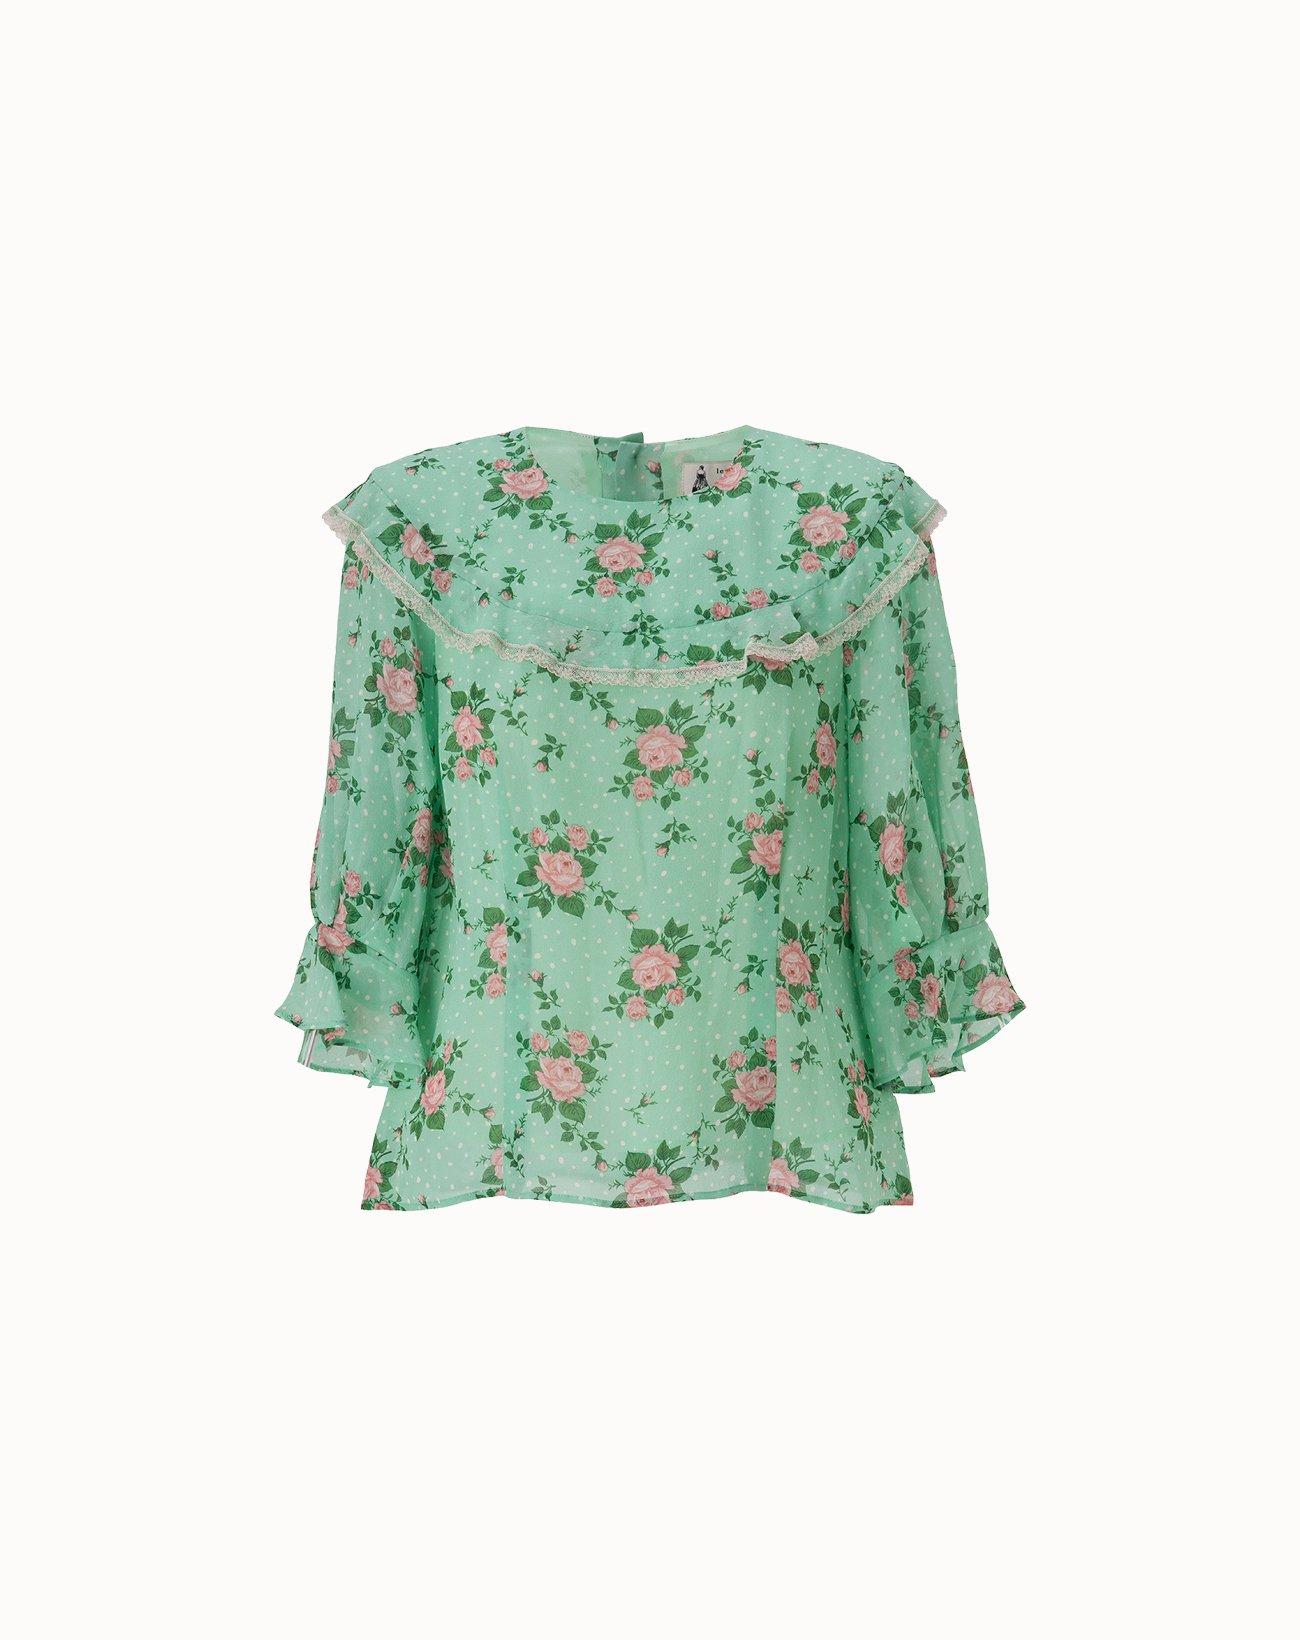 leur logette - Dot Rose Printed Blouse - Green